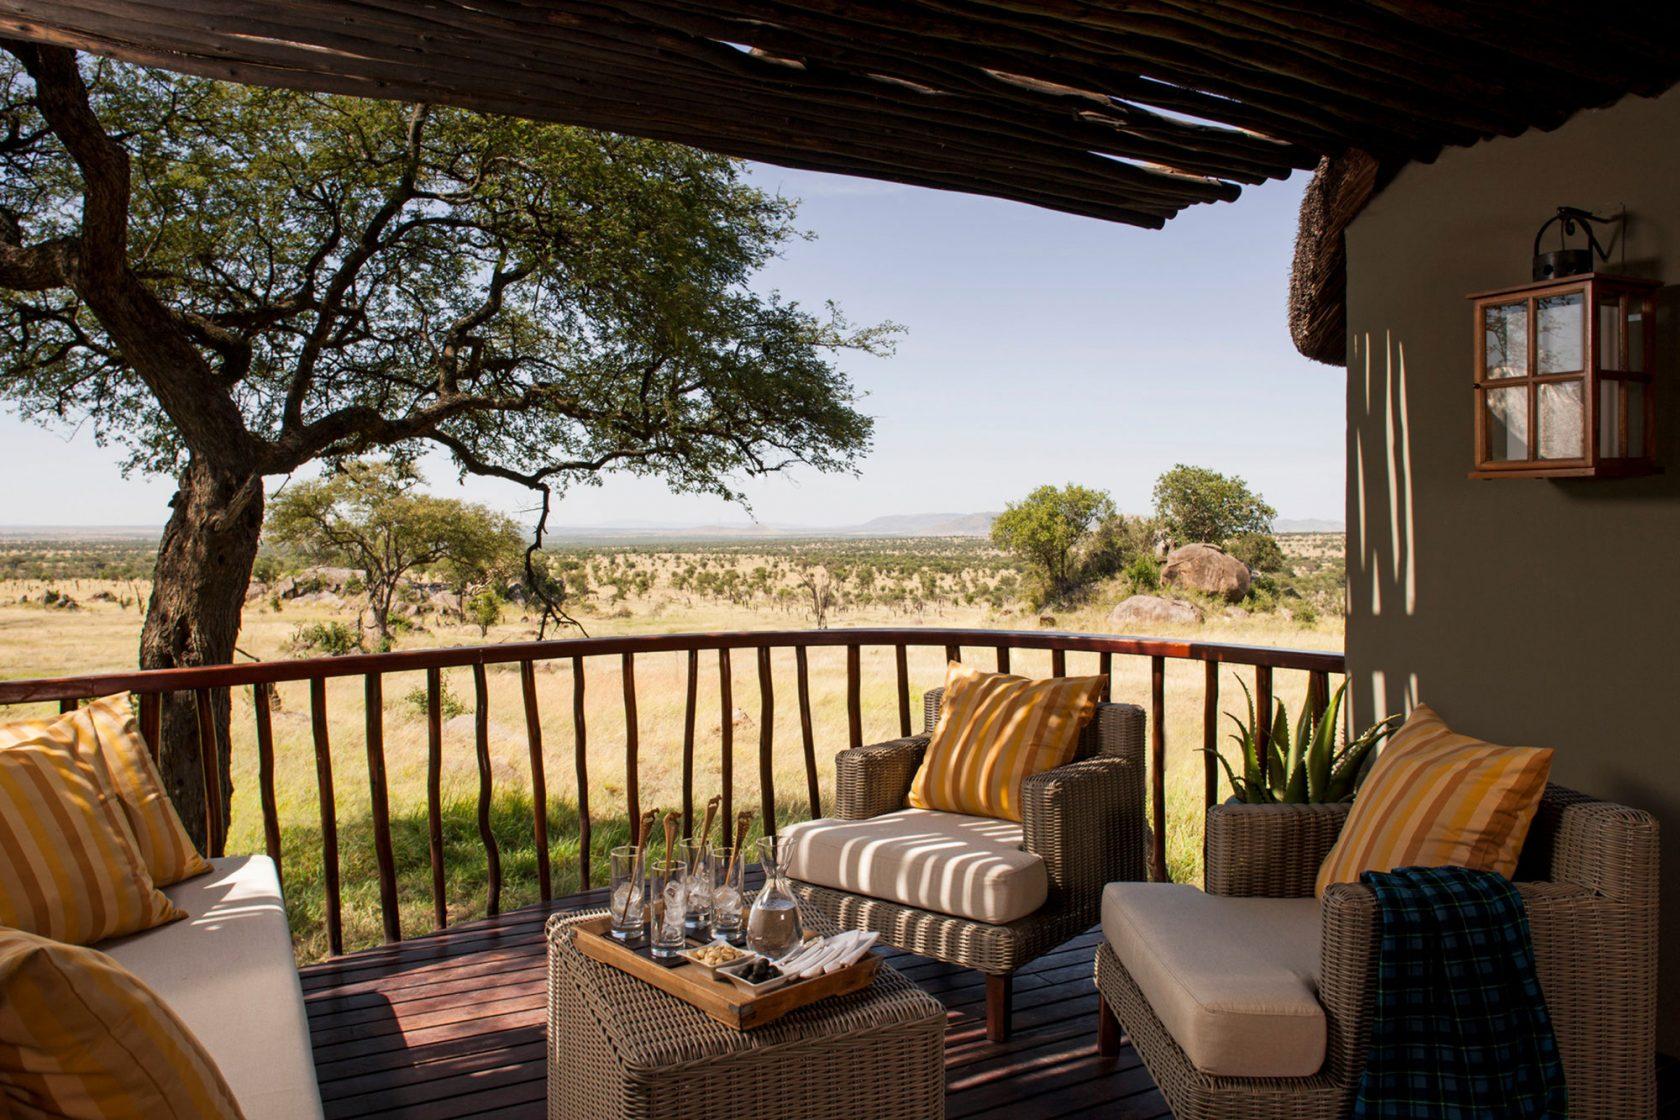 Four Seasons Safari Lodge Serengeti Room Terrace